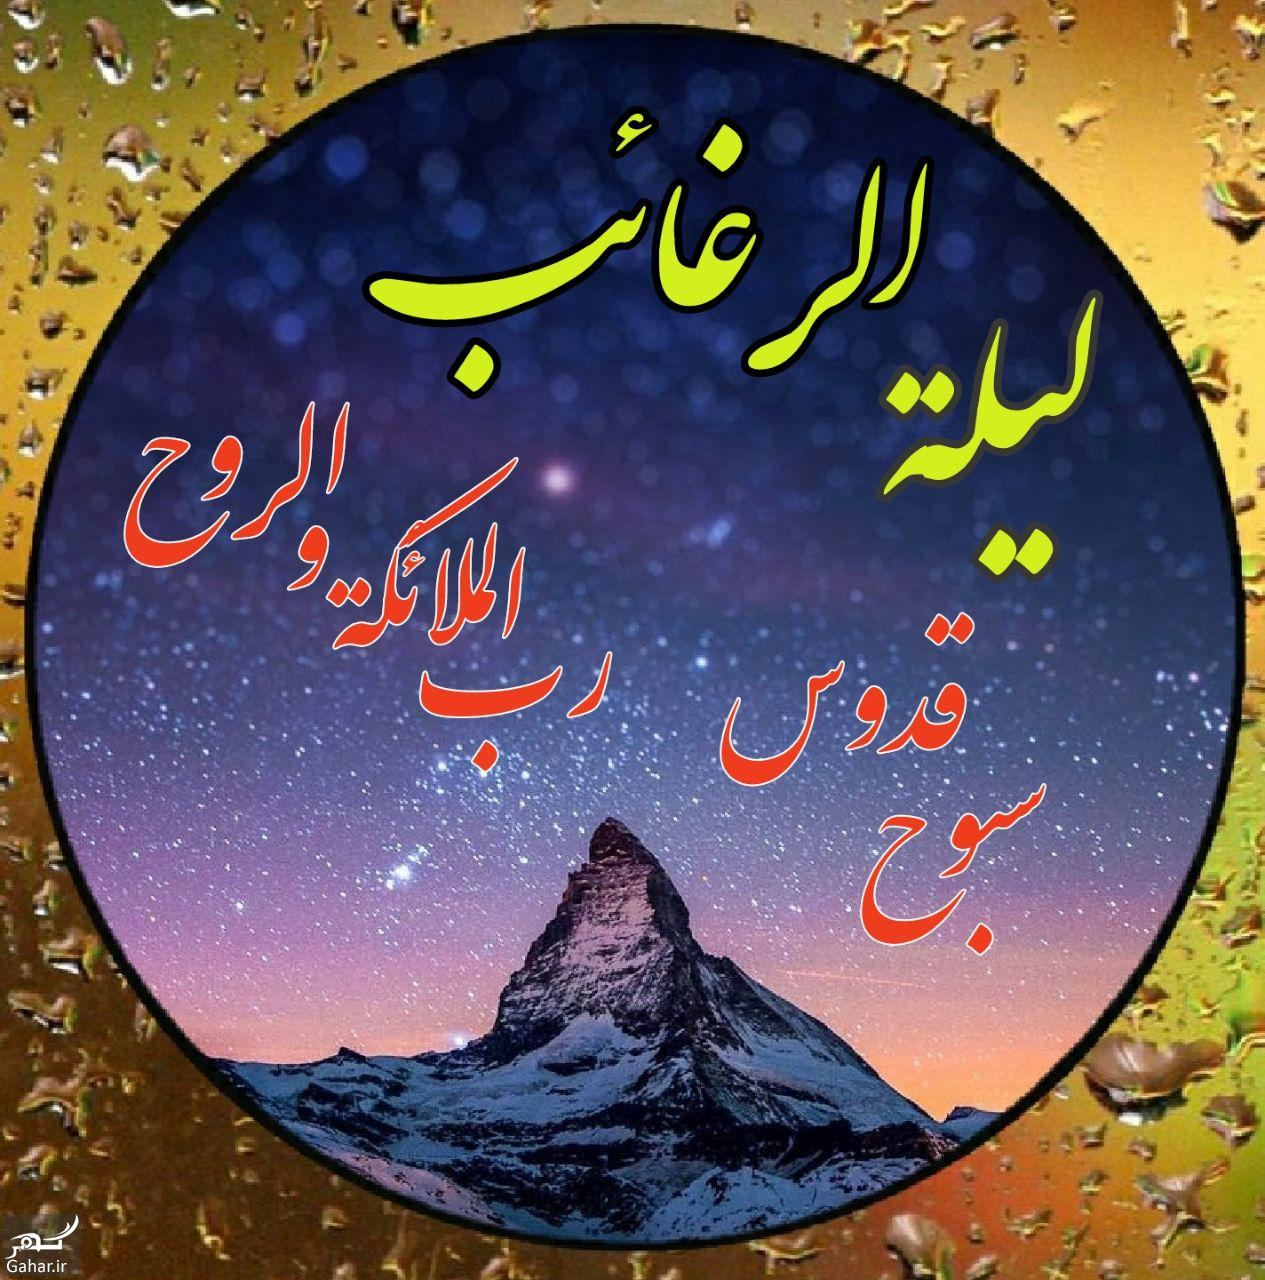 636298 Gahar ir اعمال شب لیله الرغائب (شب آرزوها) به صورت کامل